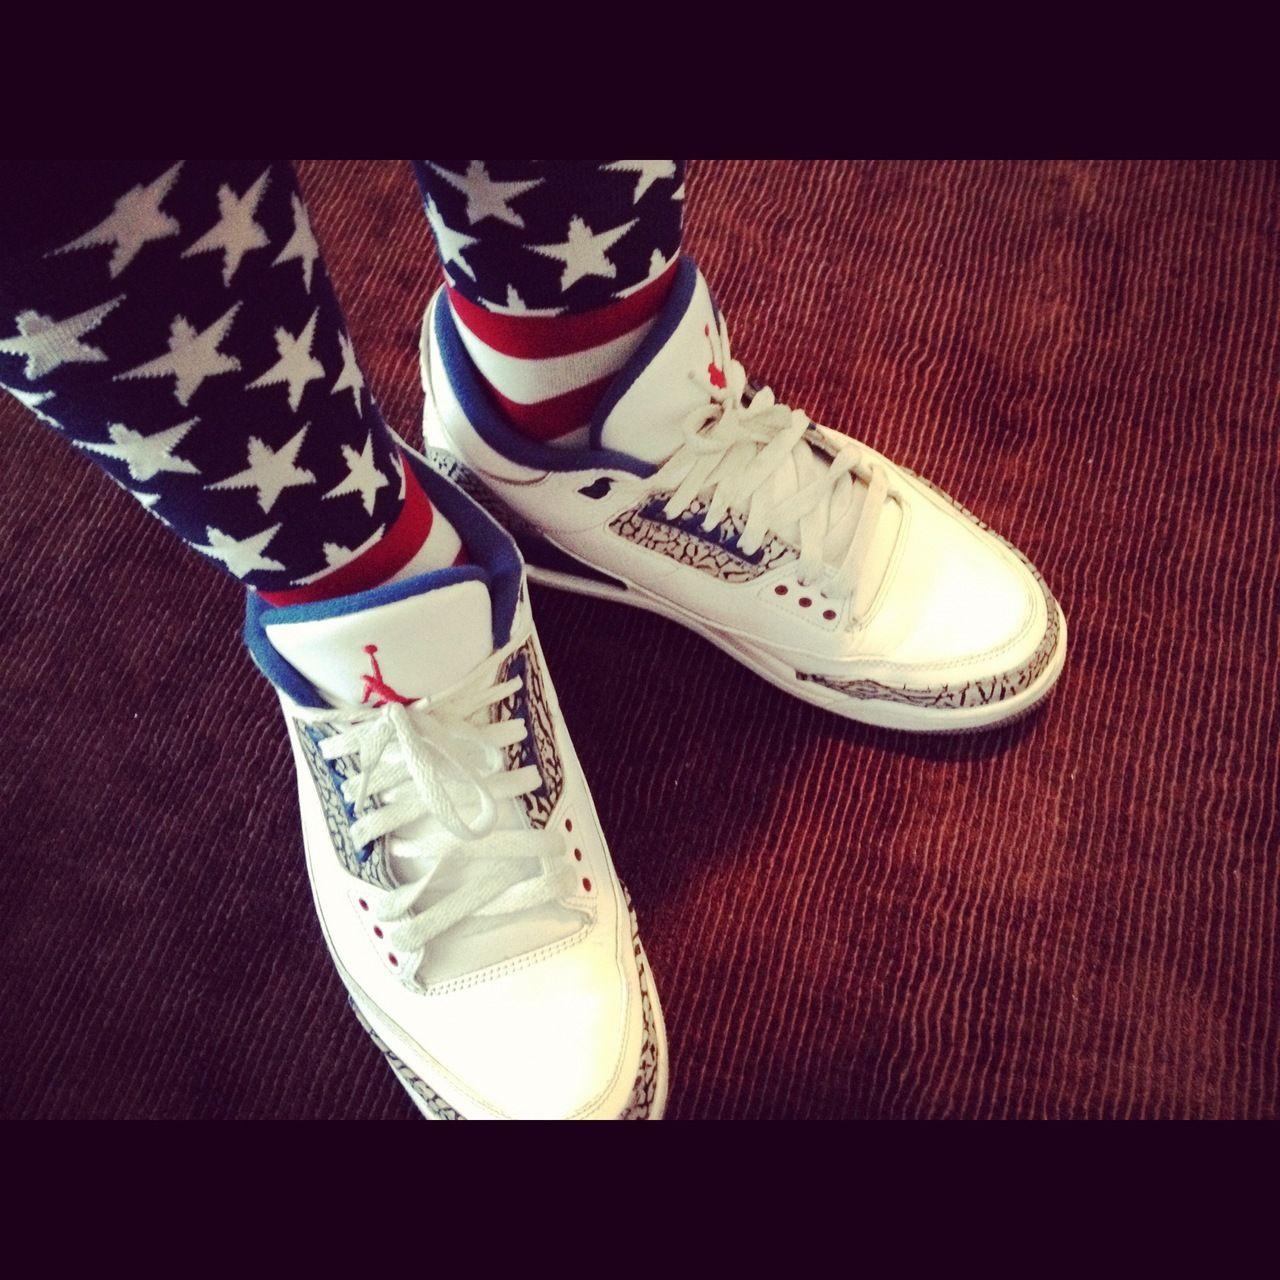 3ef9113ef7f30 ... Camp Slide 3 (13) Nike. 27.84 Jordan Hydro 5 Retro - Mens - Red Black  Jordan 3s True Blue USA ...